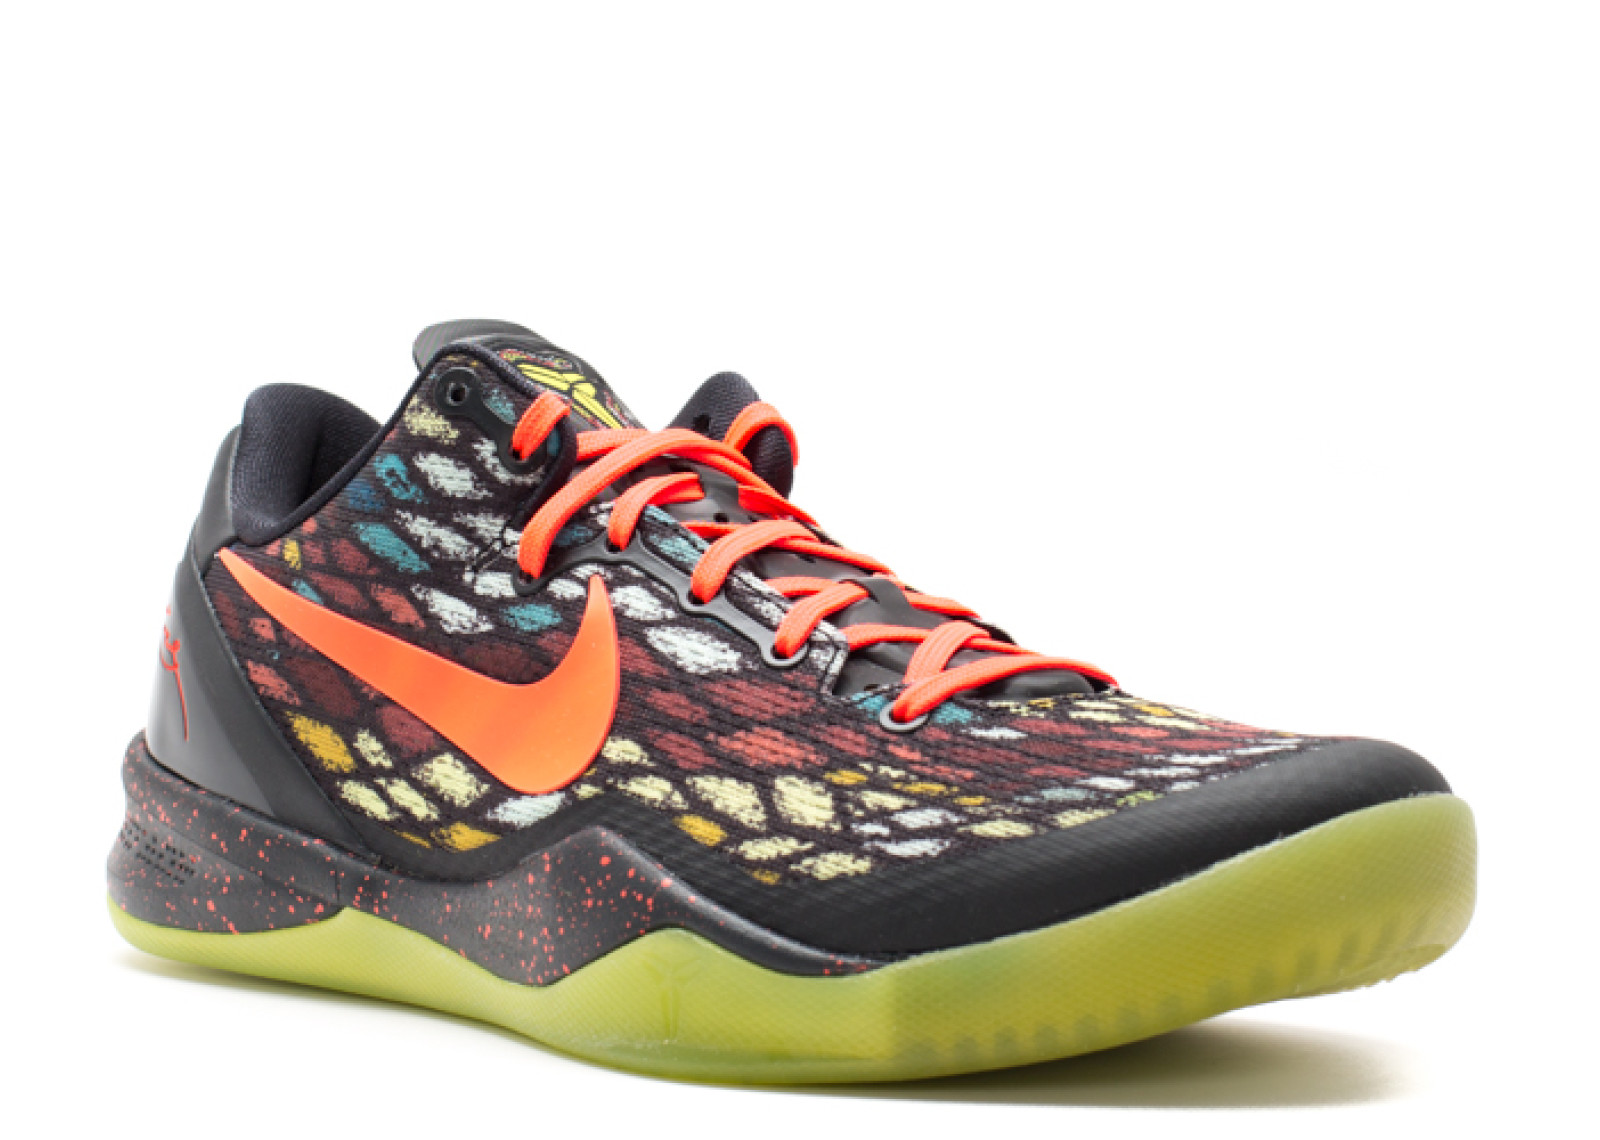 official photos c982a db3ca Nike - Men - Kobe 8 System  Christmas  - 555035-030 - Size 11